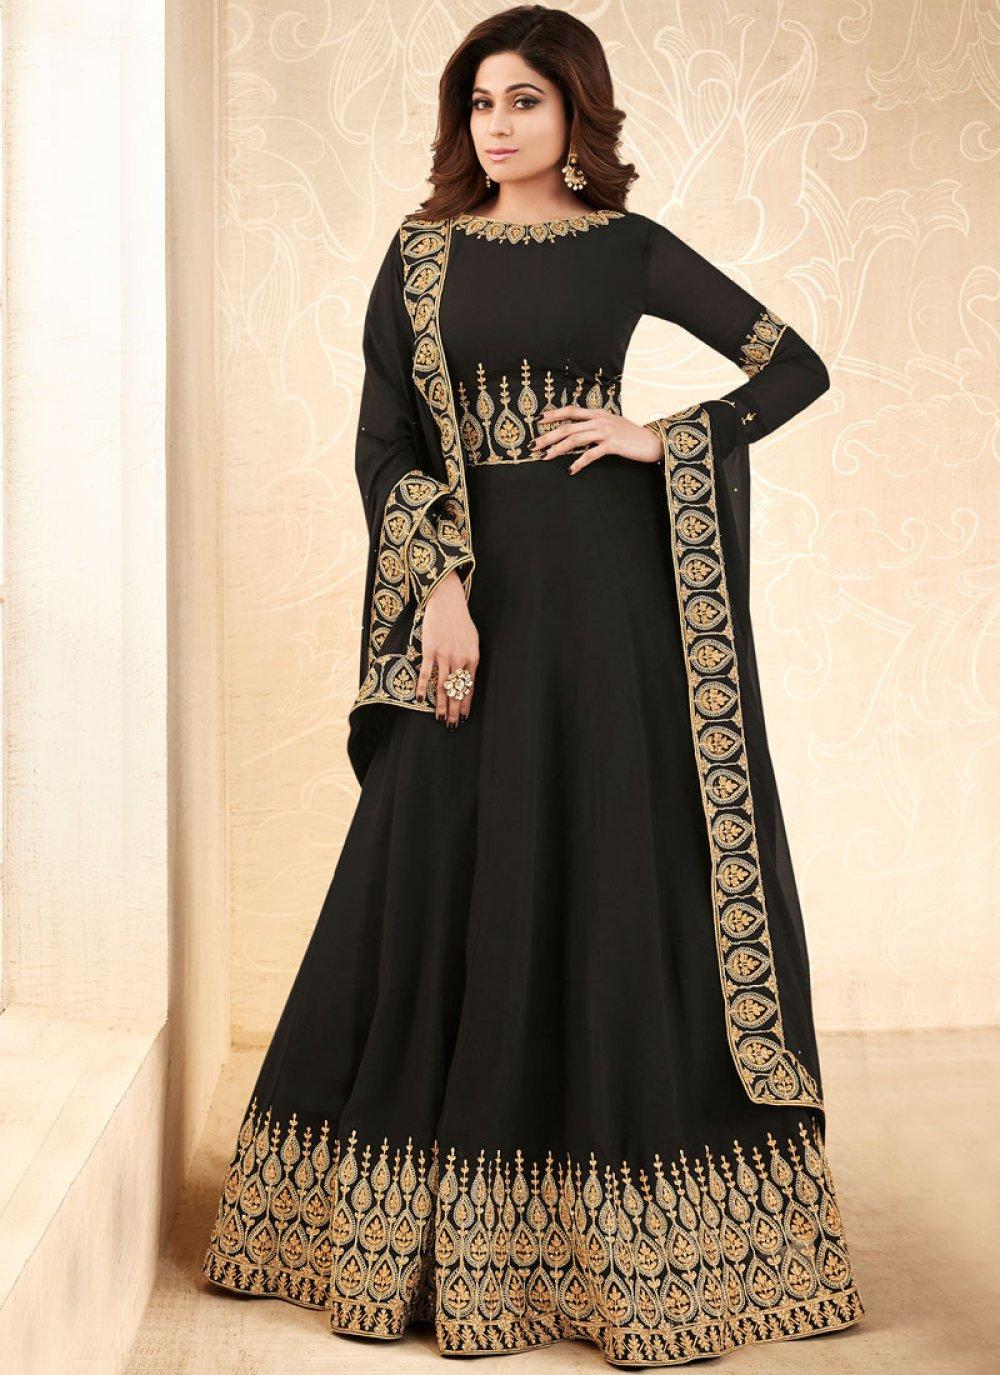 Shamita Shetty Patch Border Black Faux Georgette Floor Length Anarkali Suit